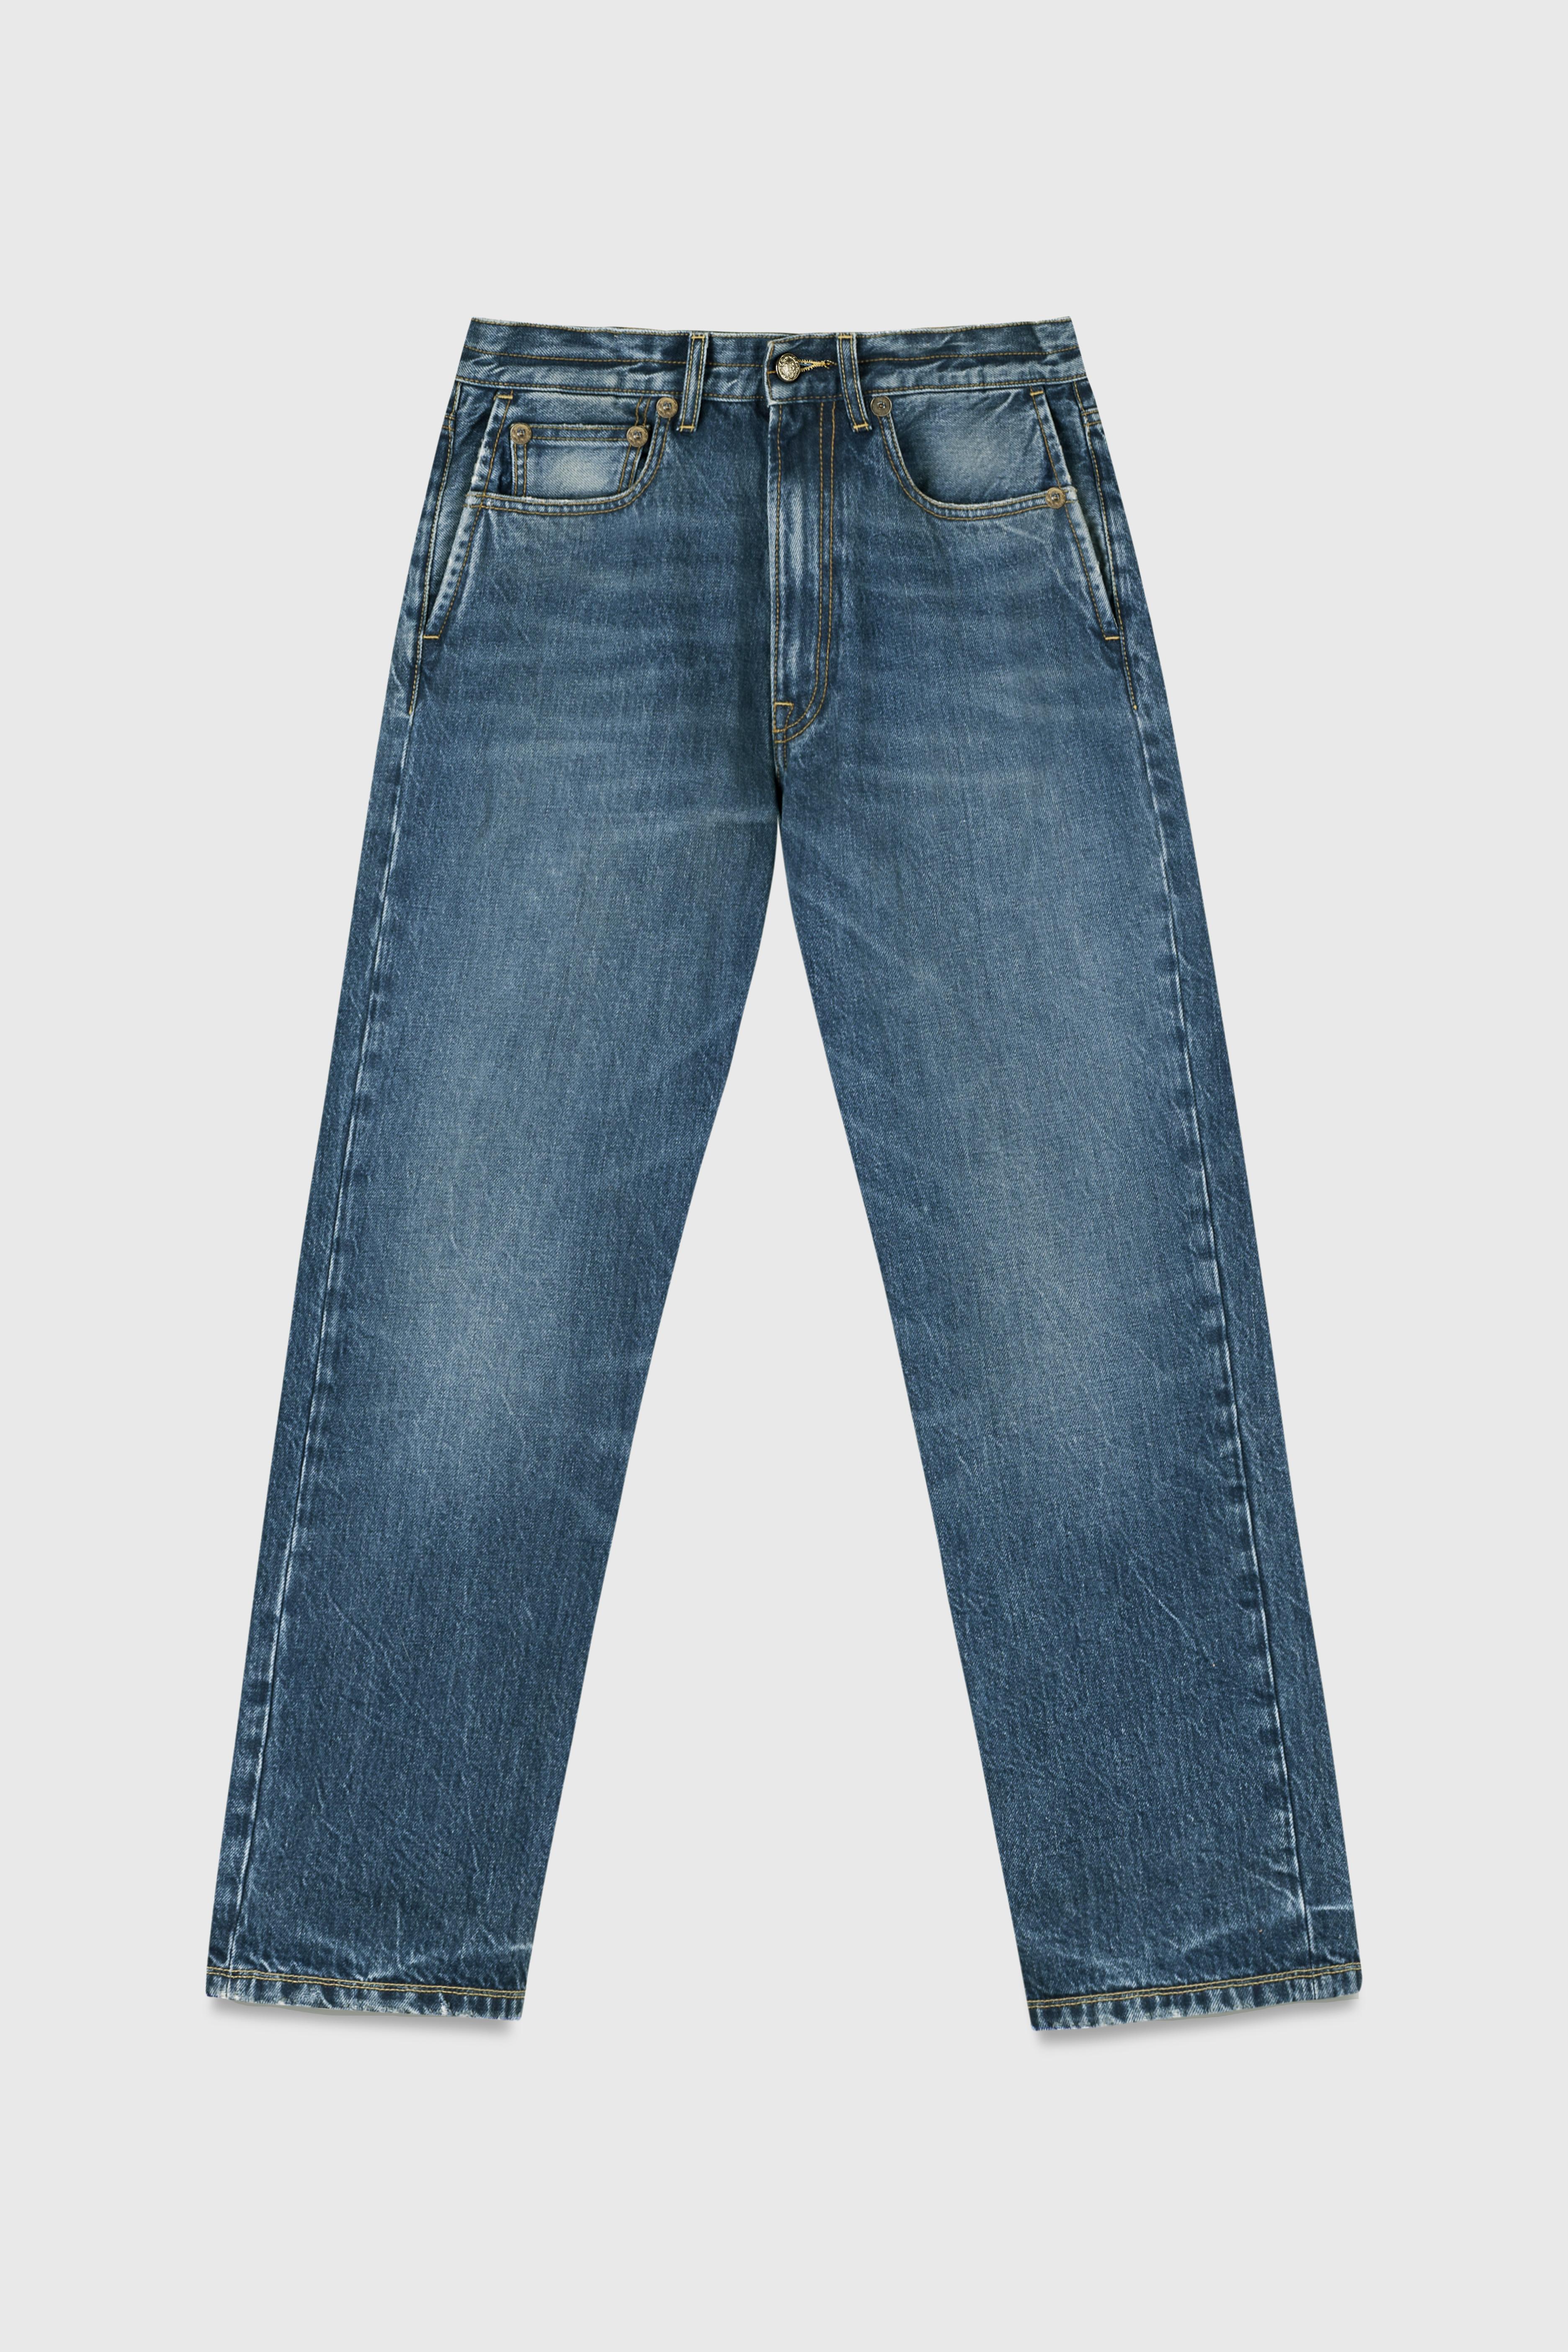 Washed denim boyfriend jeans Small Image 3